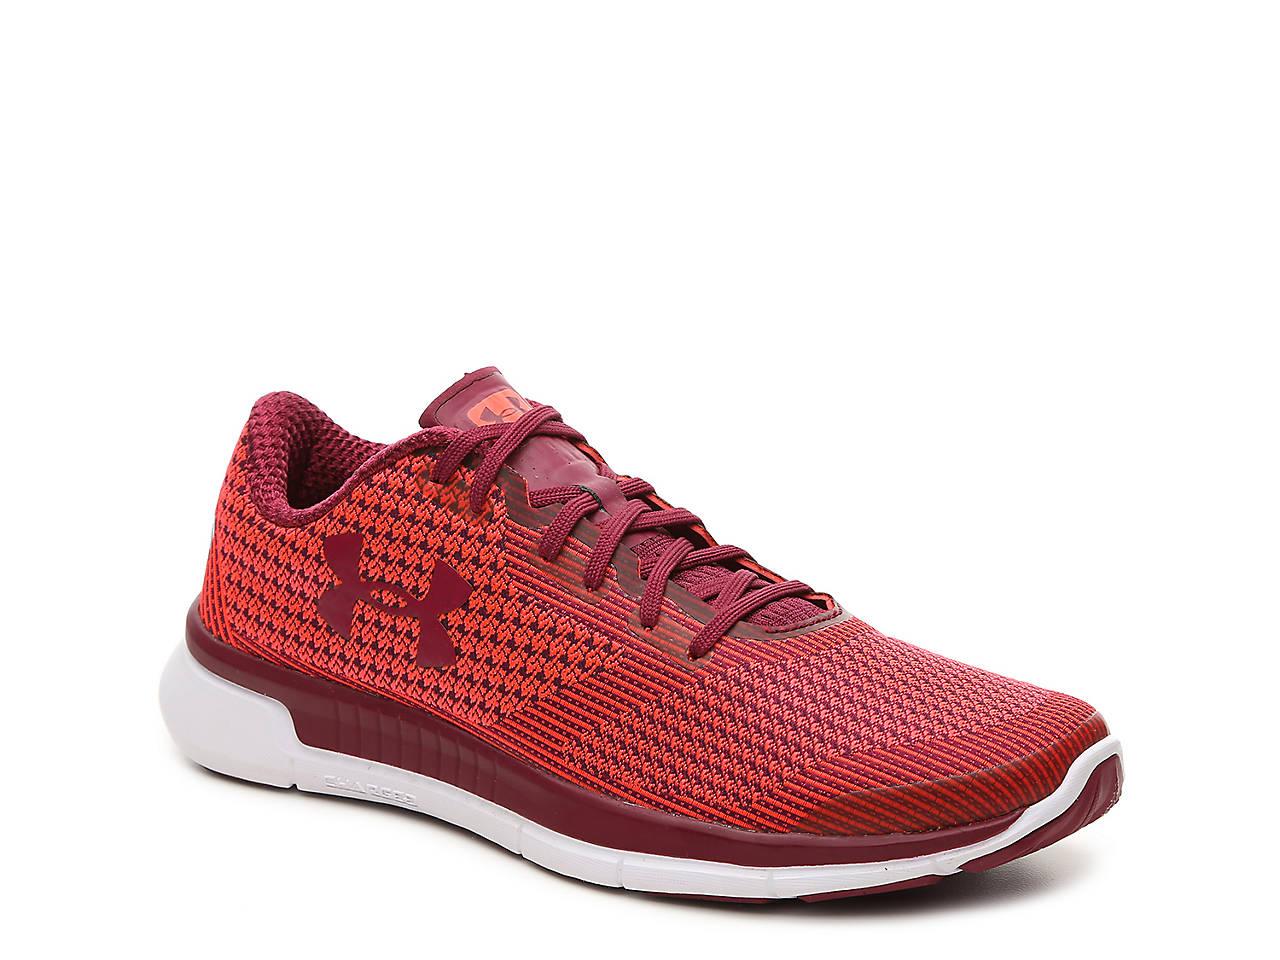 sports shoes ed4d2 47629 Charged Lightning Lightweight Running Shoe - Women's